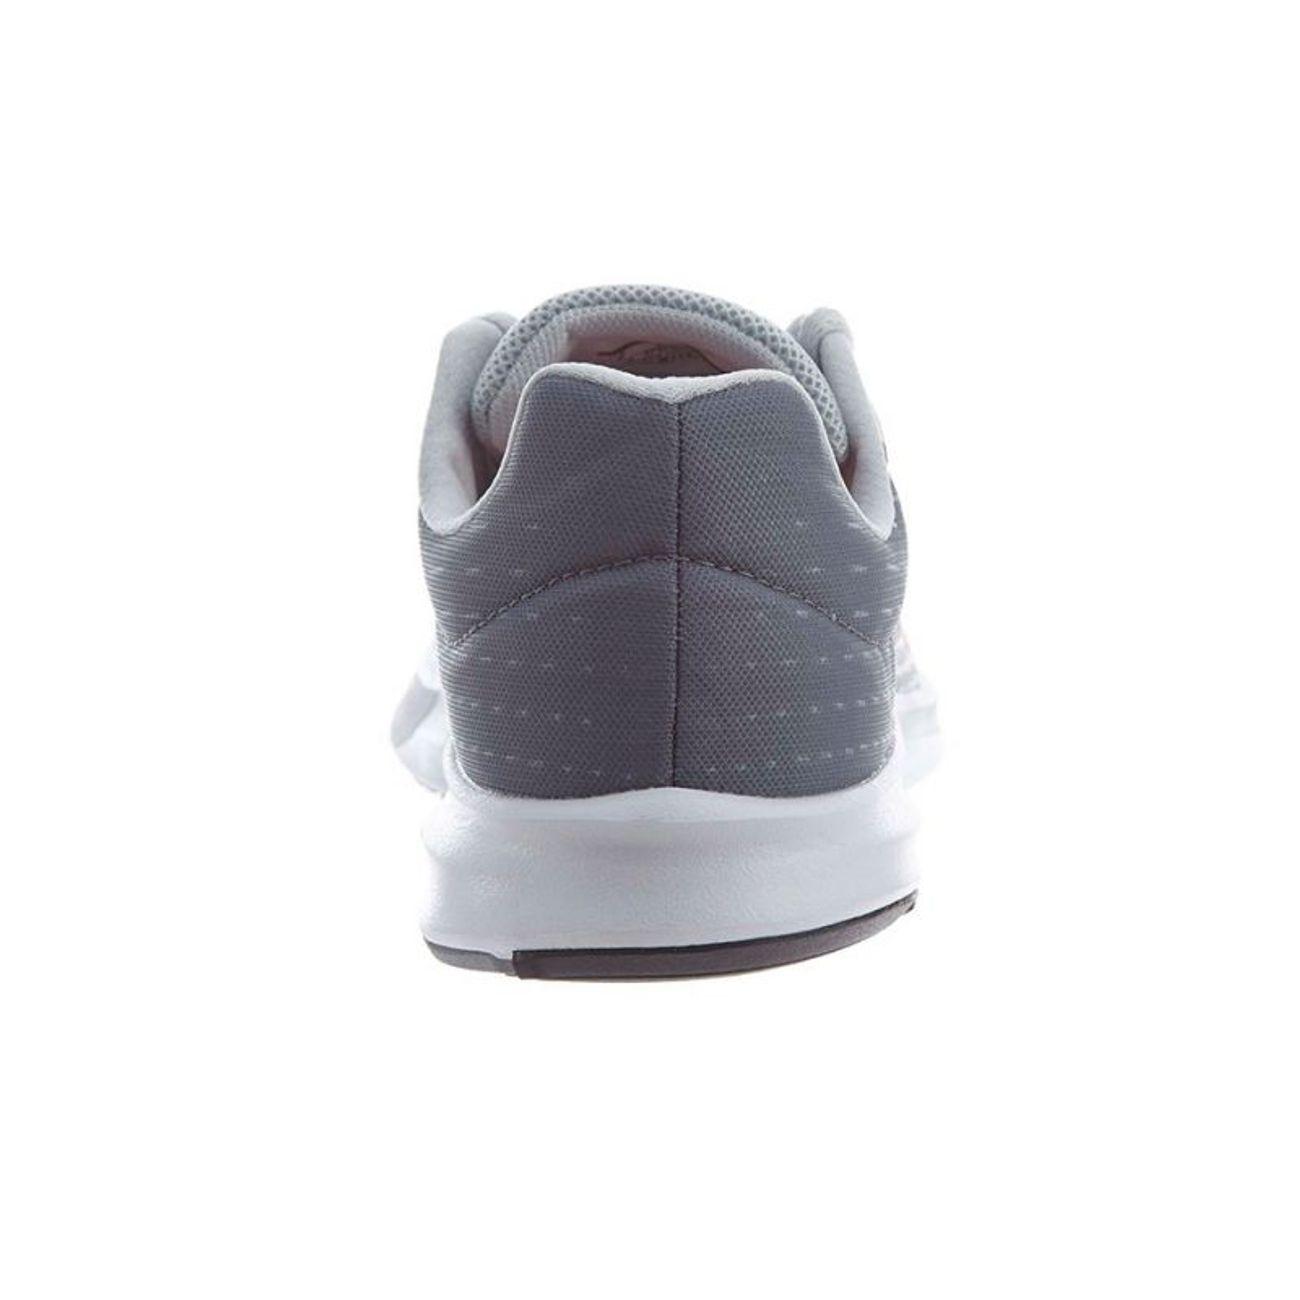 Downshifter Adulte Nike Padel 8 Ni908984 Gris 012 SUVzMpqG